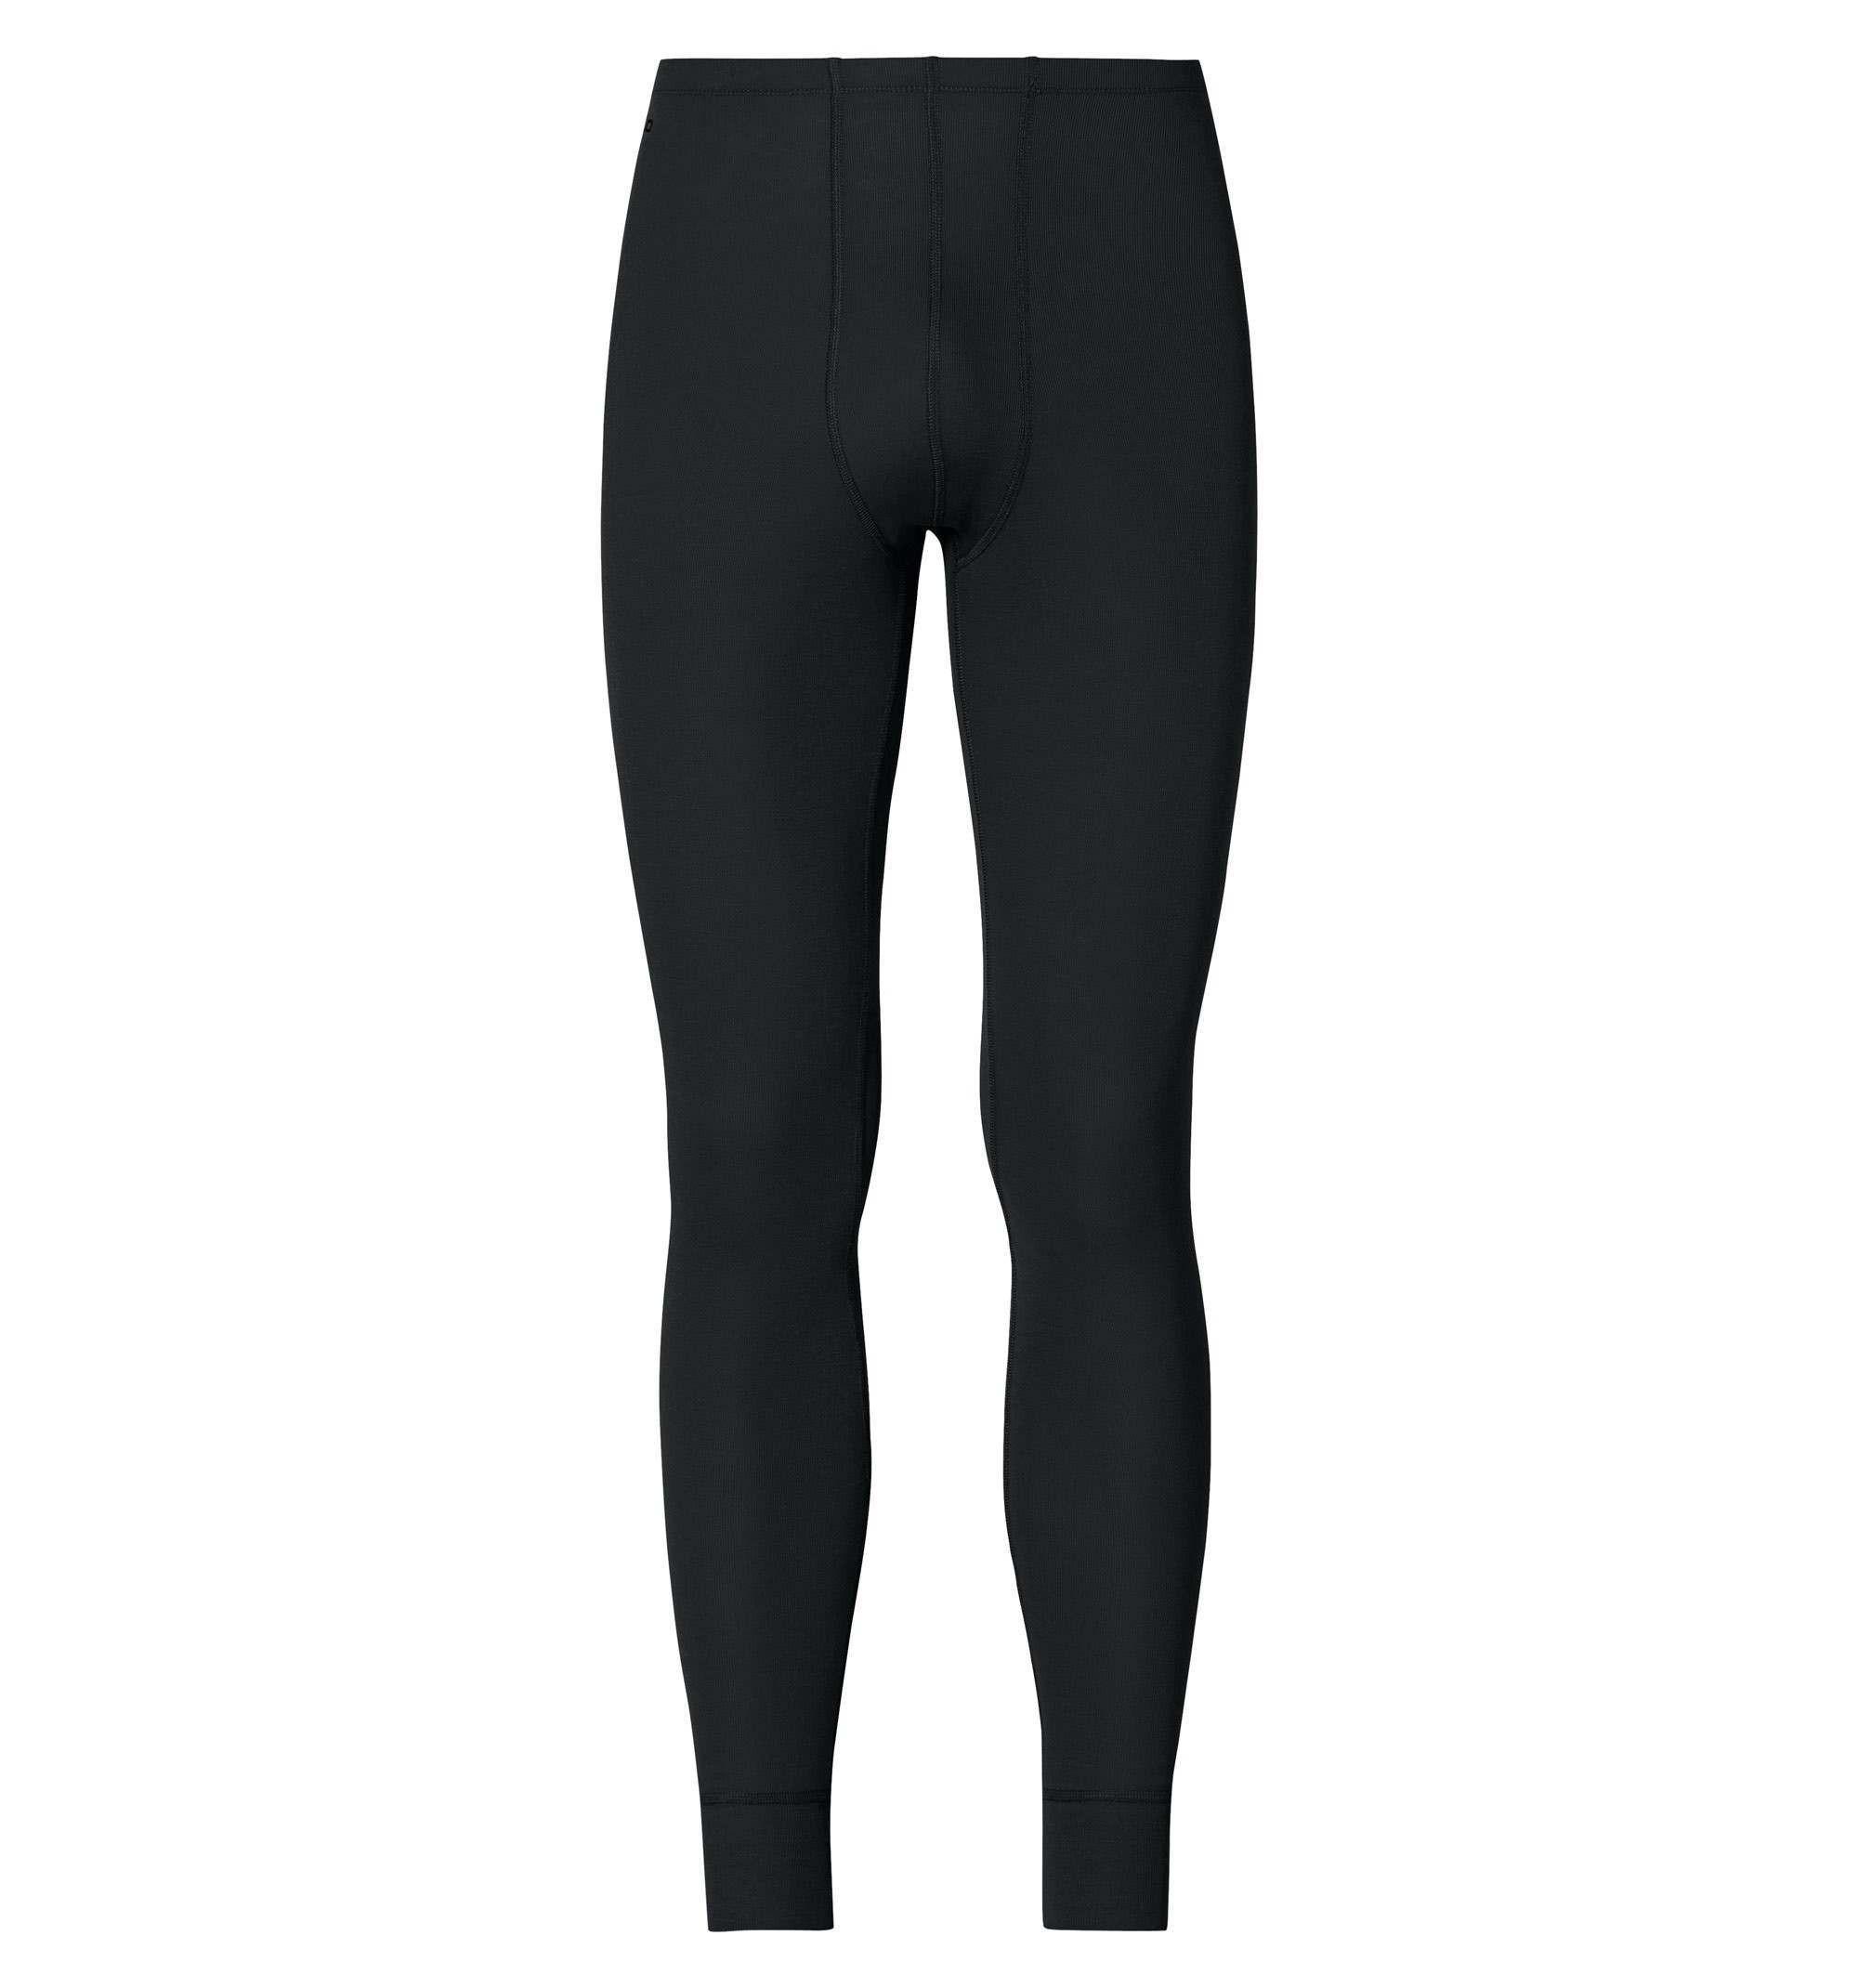 Термоштаны Odlo Warm Black XL (152042)